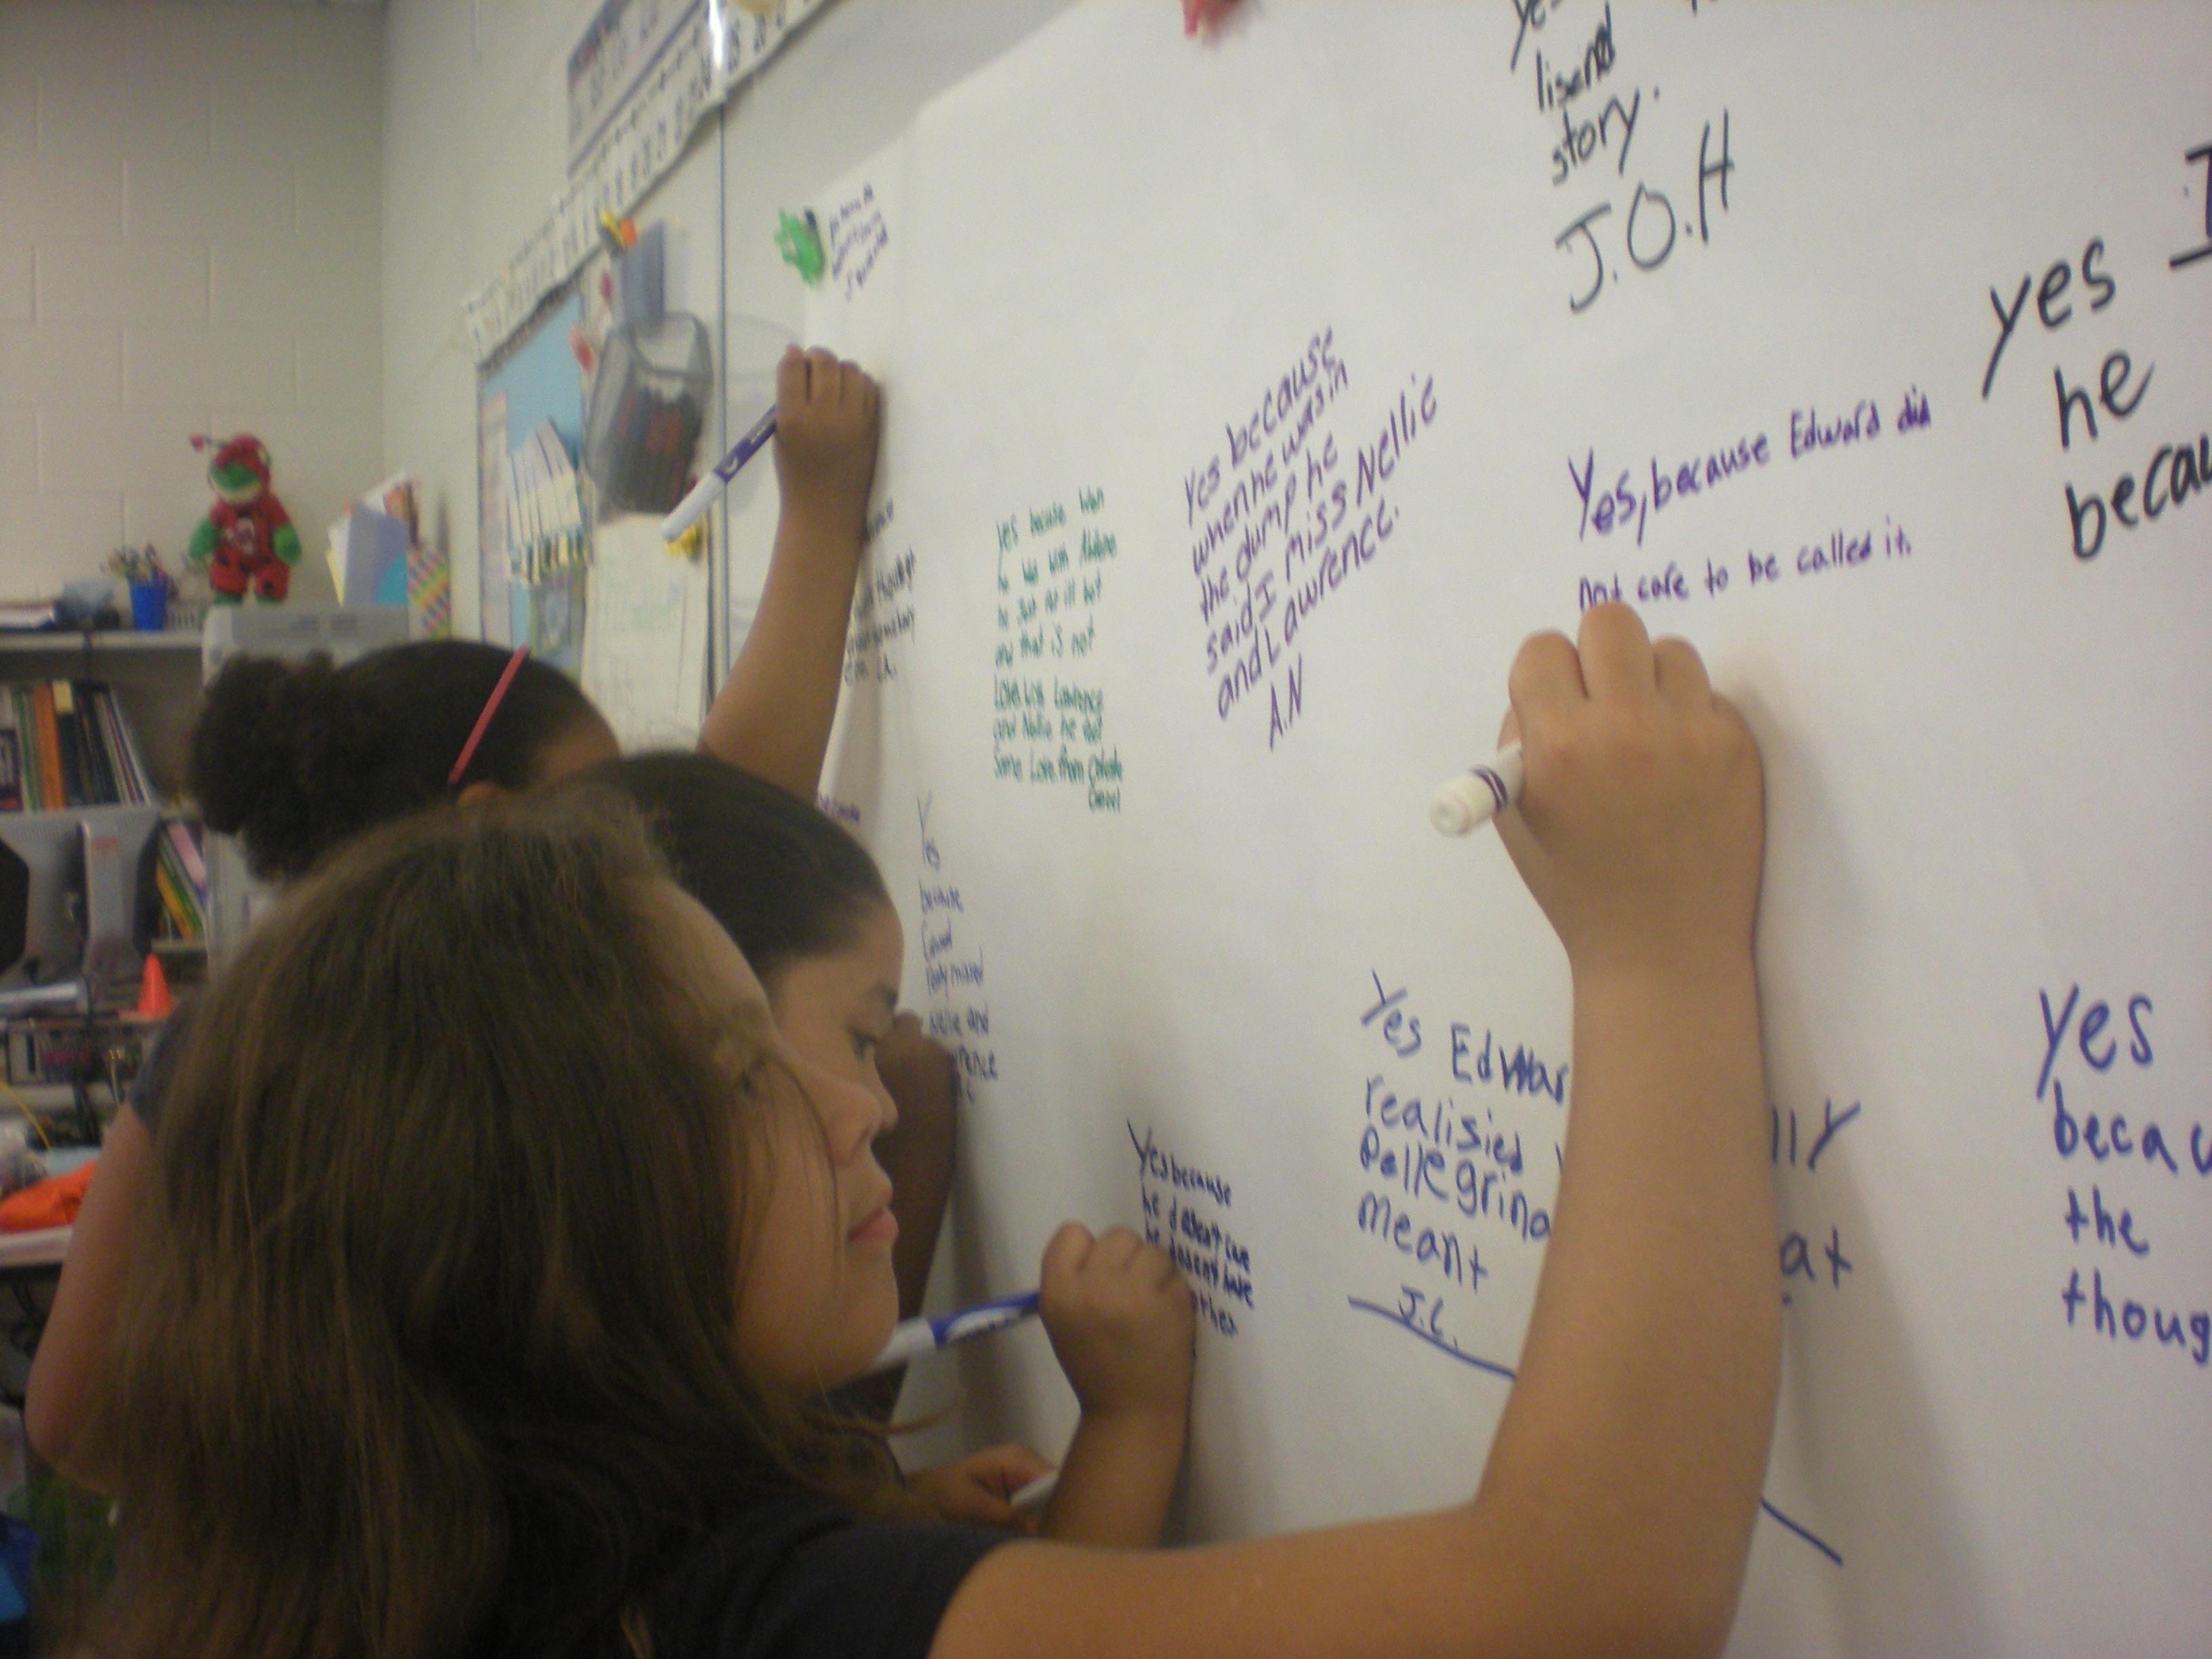 Chart Holder For Classroom: Chalkboard Splash.jpg - Wikimedia Commons,Chart